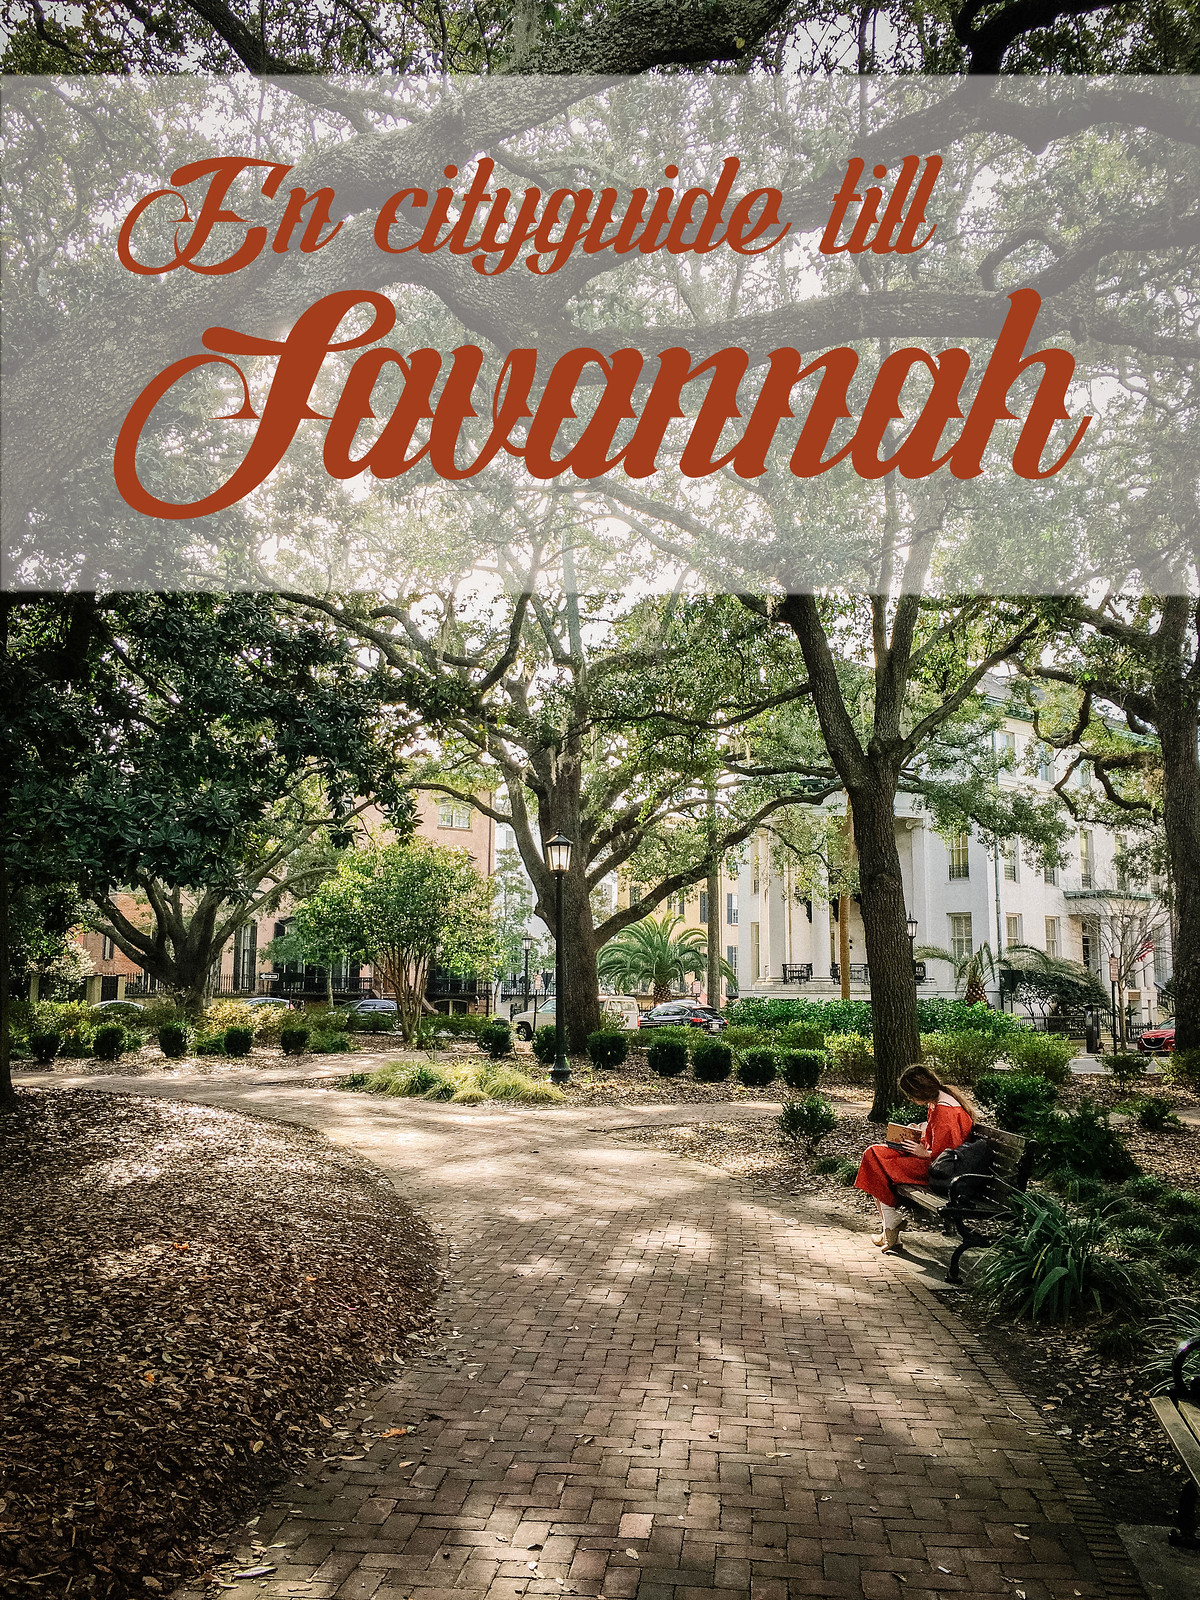 En cityguide till Savannah